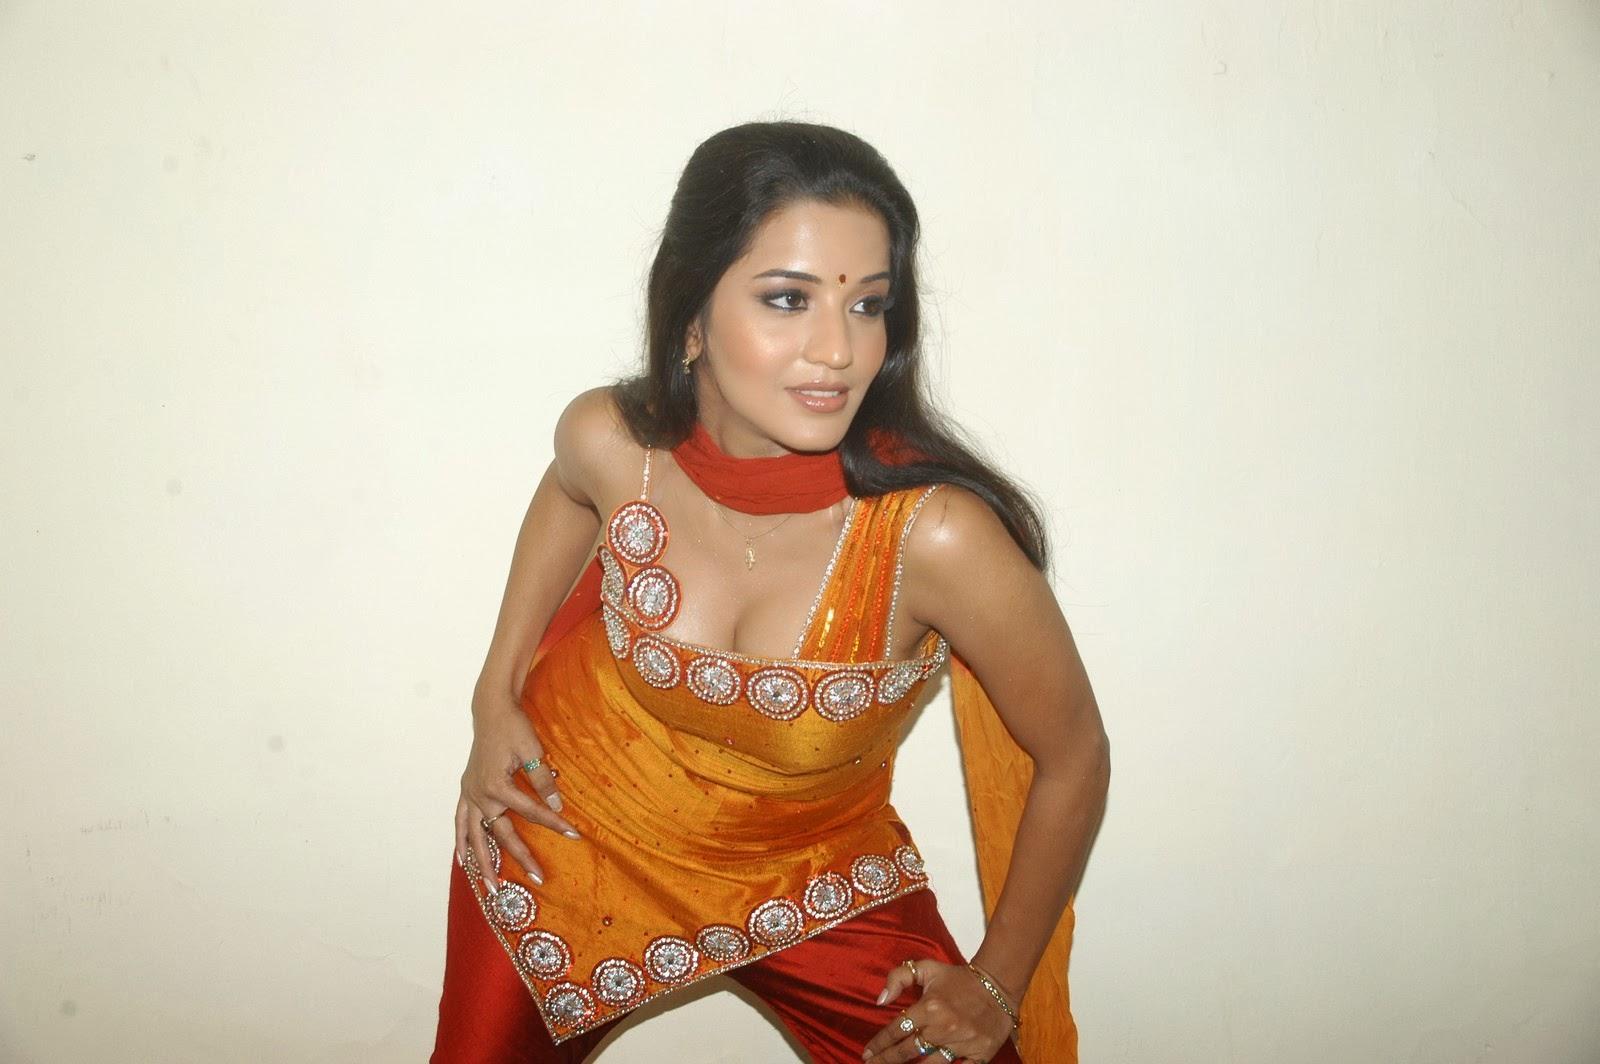 bhojpuri actress monalisa wallpapers